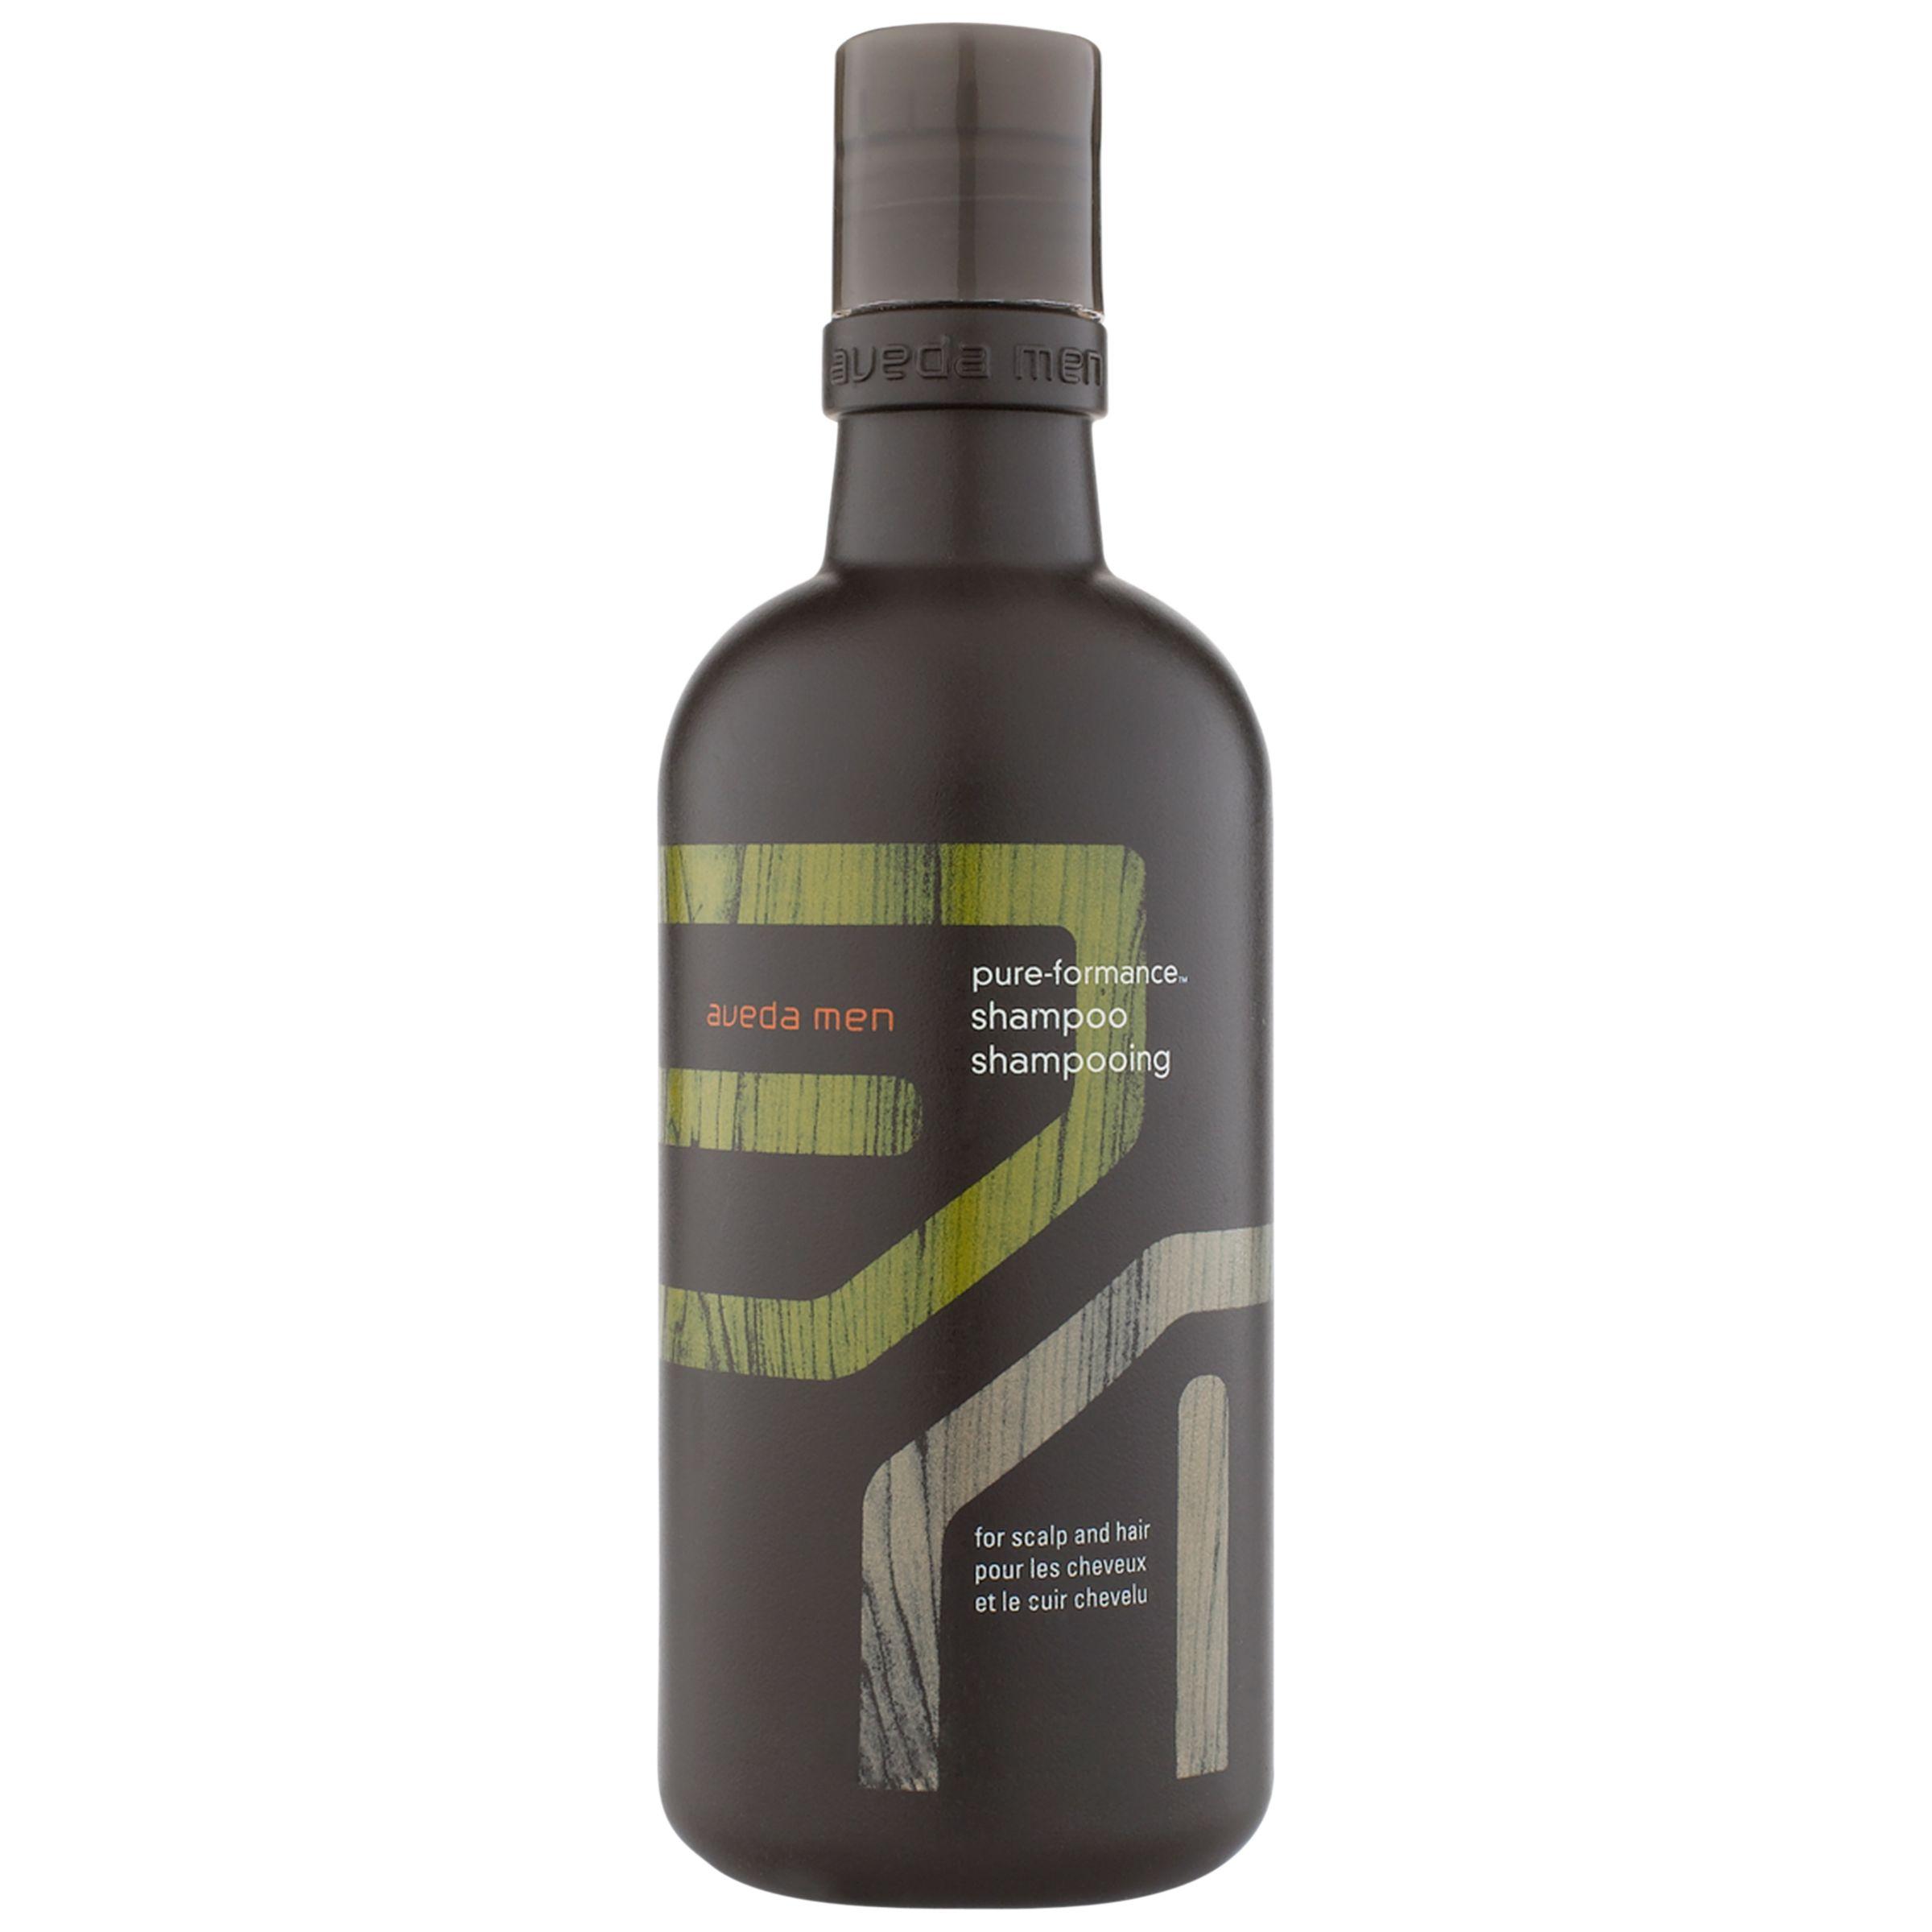 AVEDA Aveda Mens Pure-Formance Shampoo, 50ml